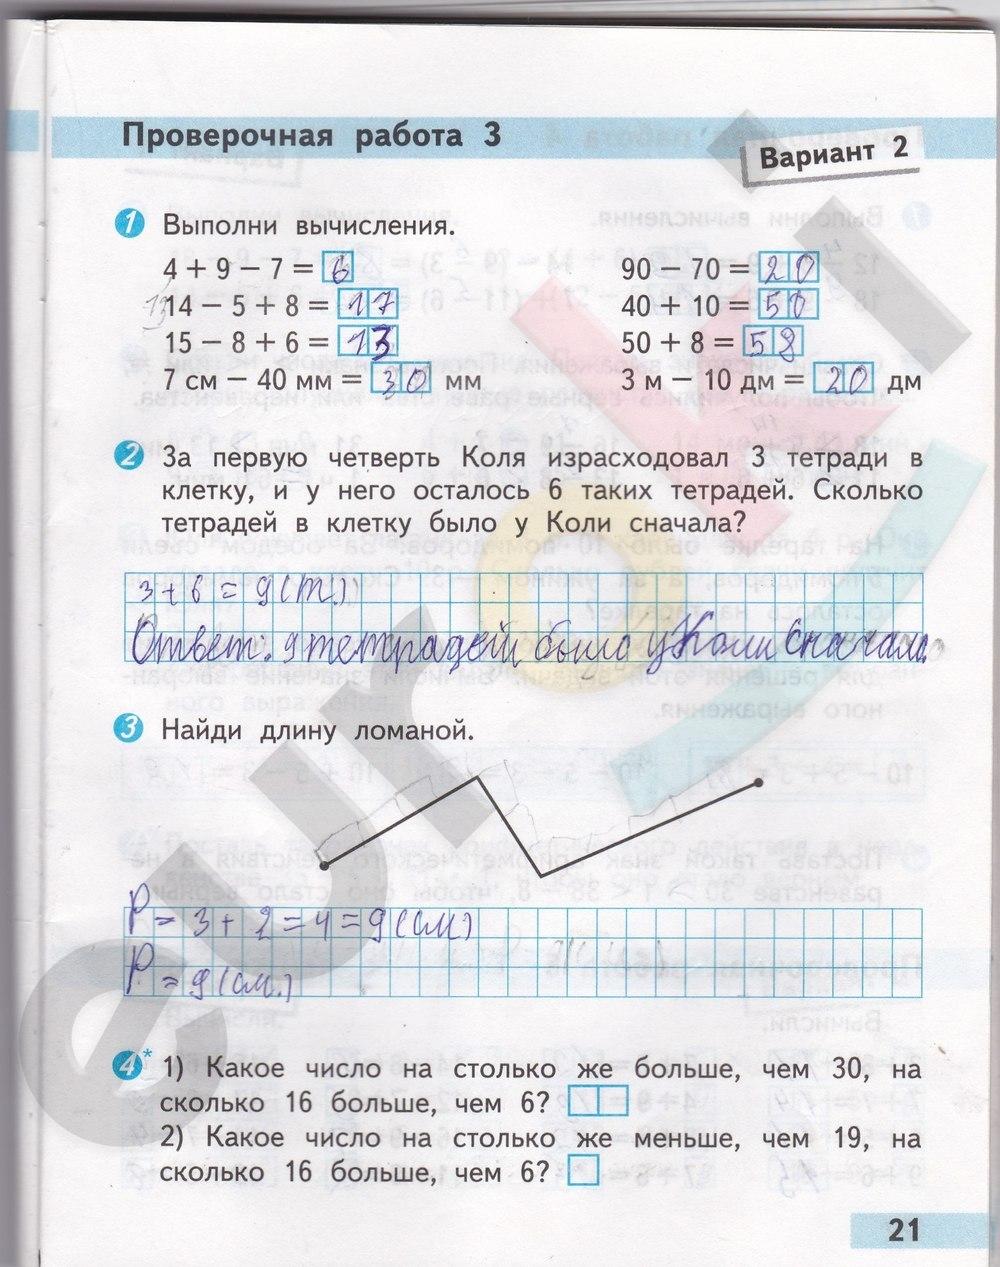 решебник по математике 2 класс волково